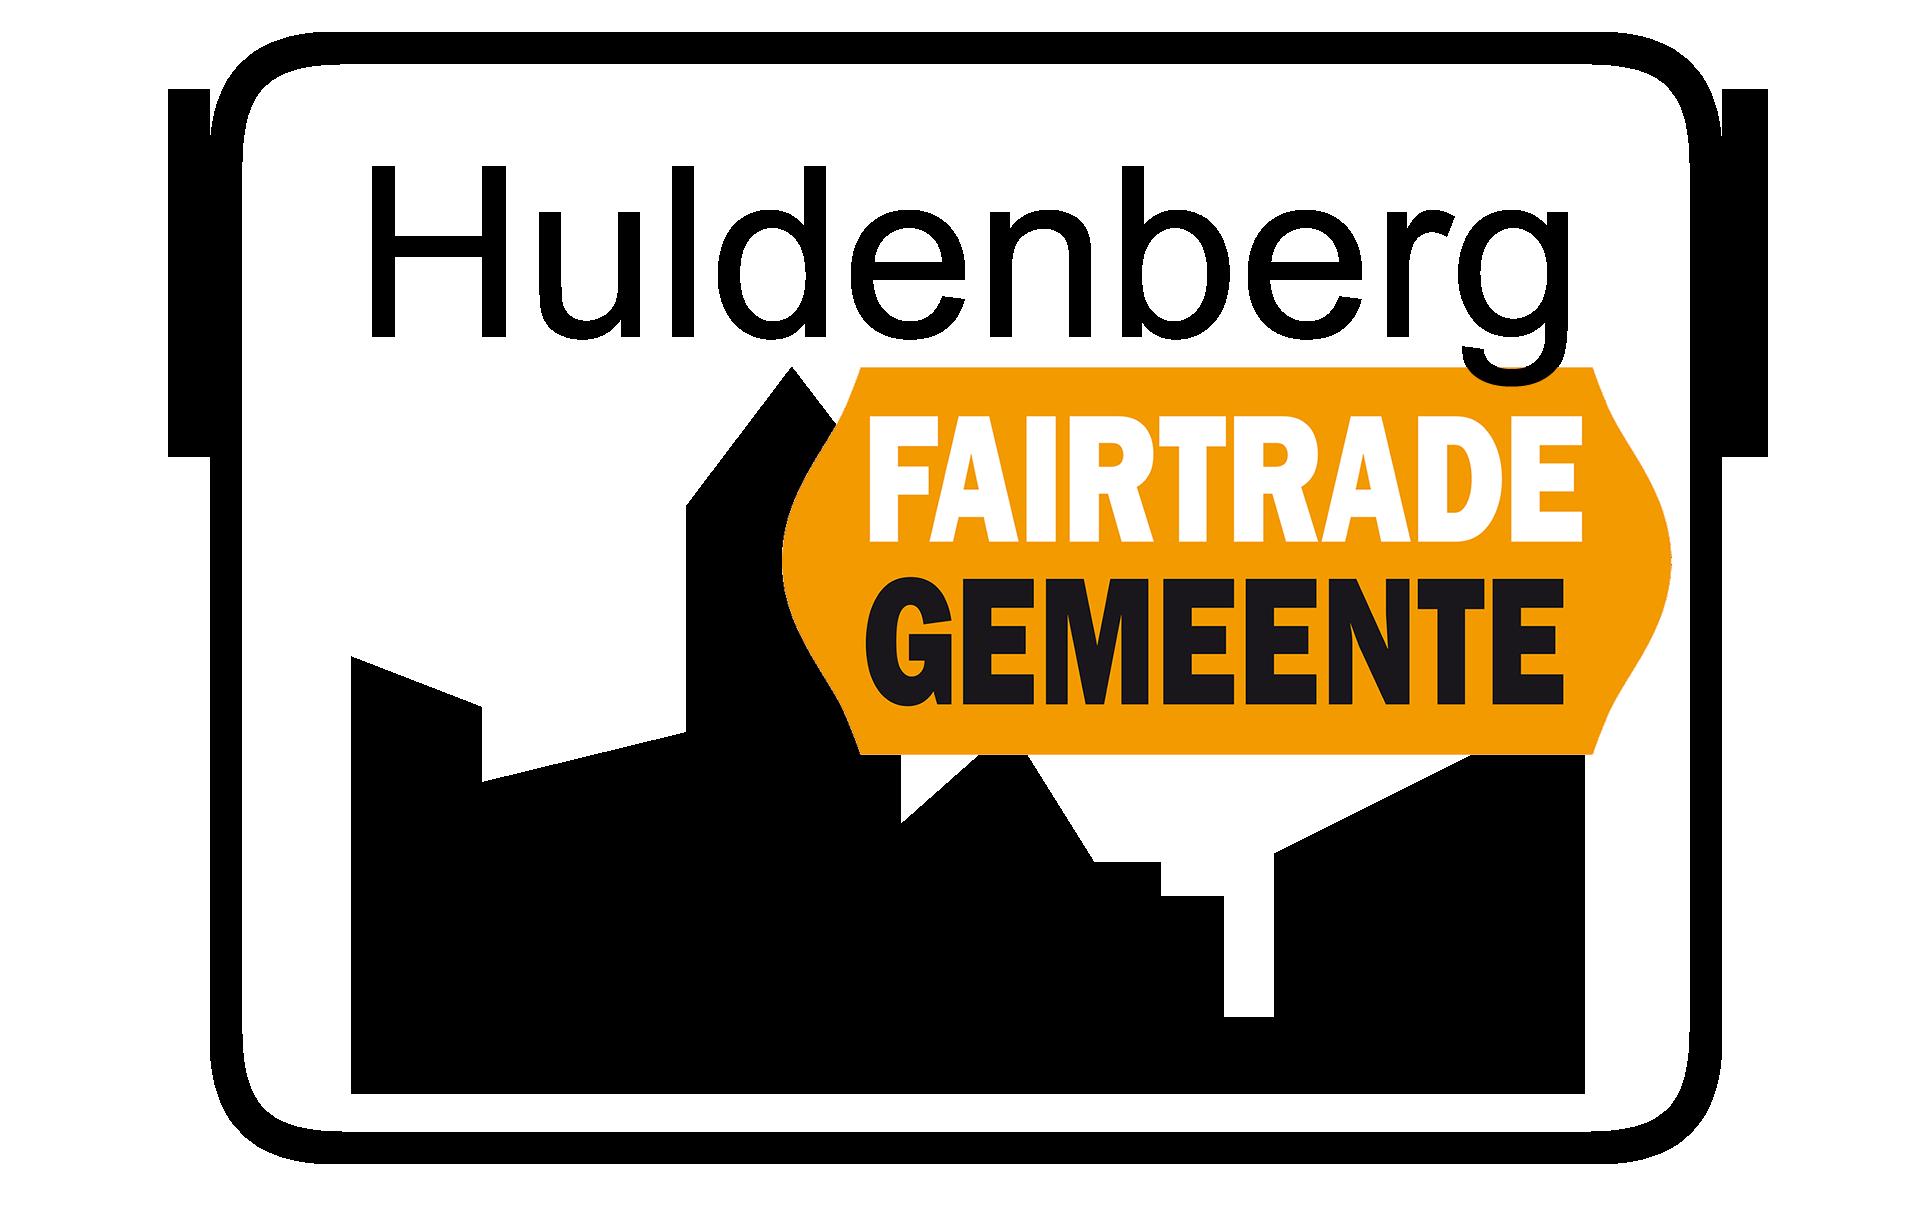 FairTrade Gemeente - Huldenberg